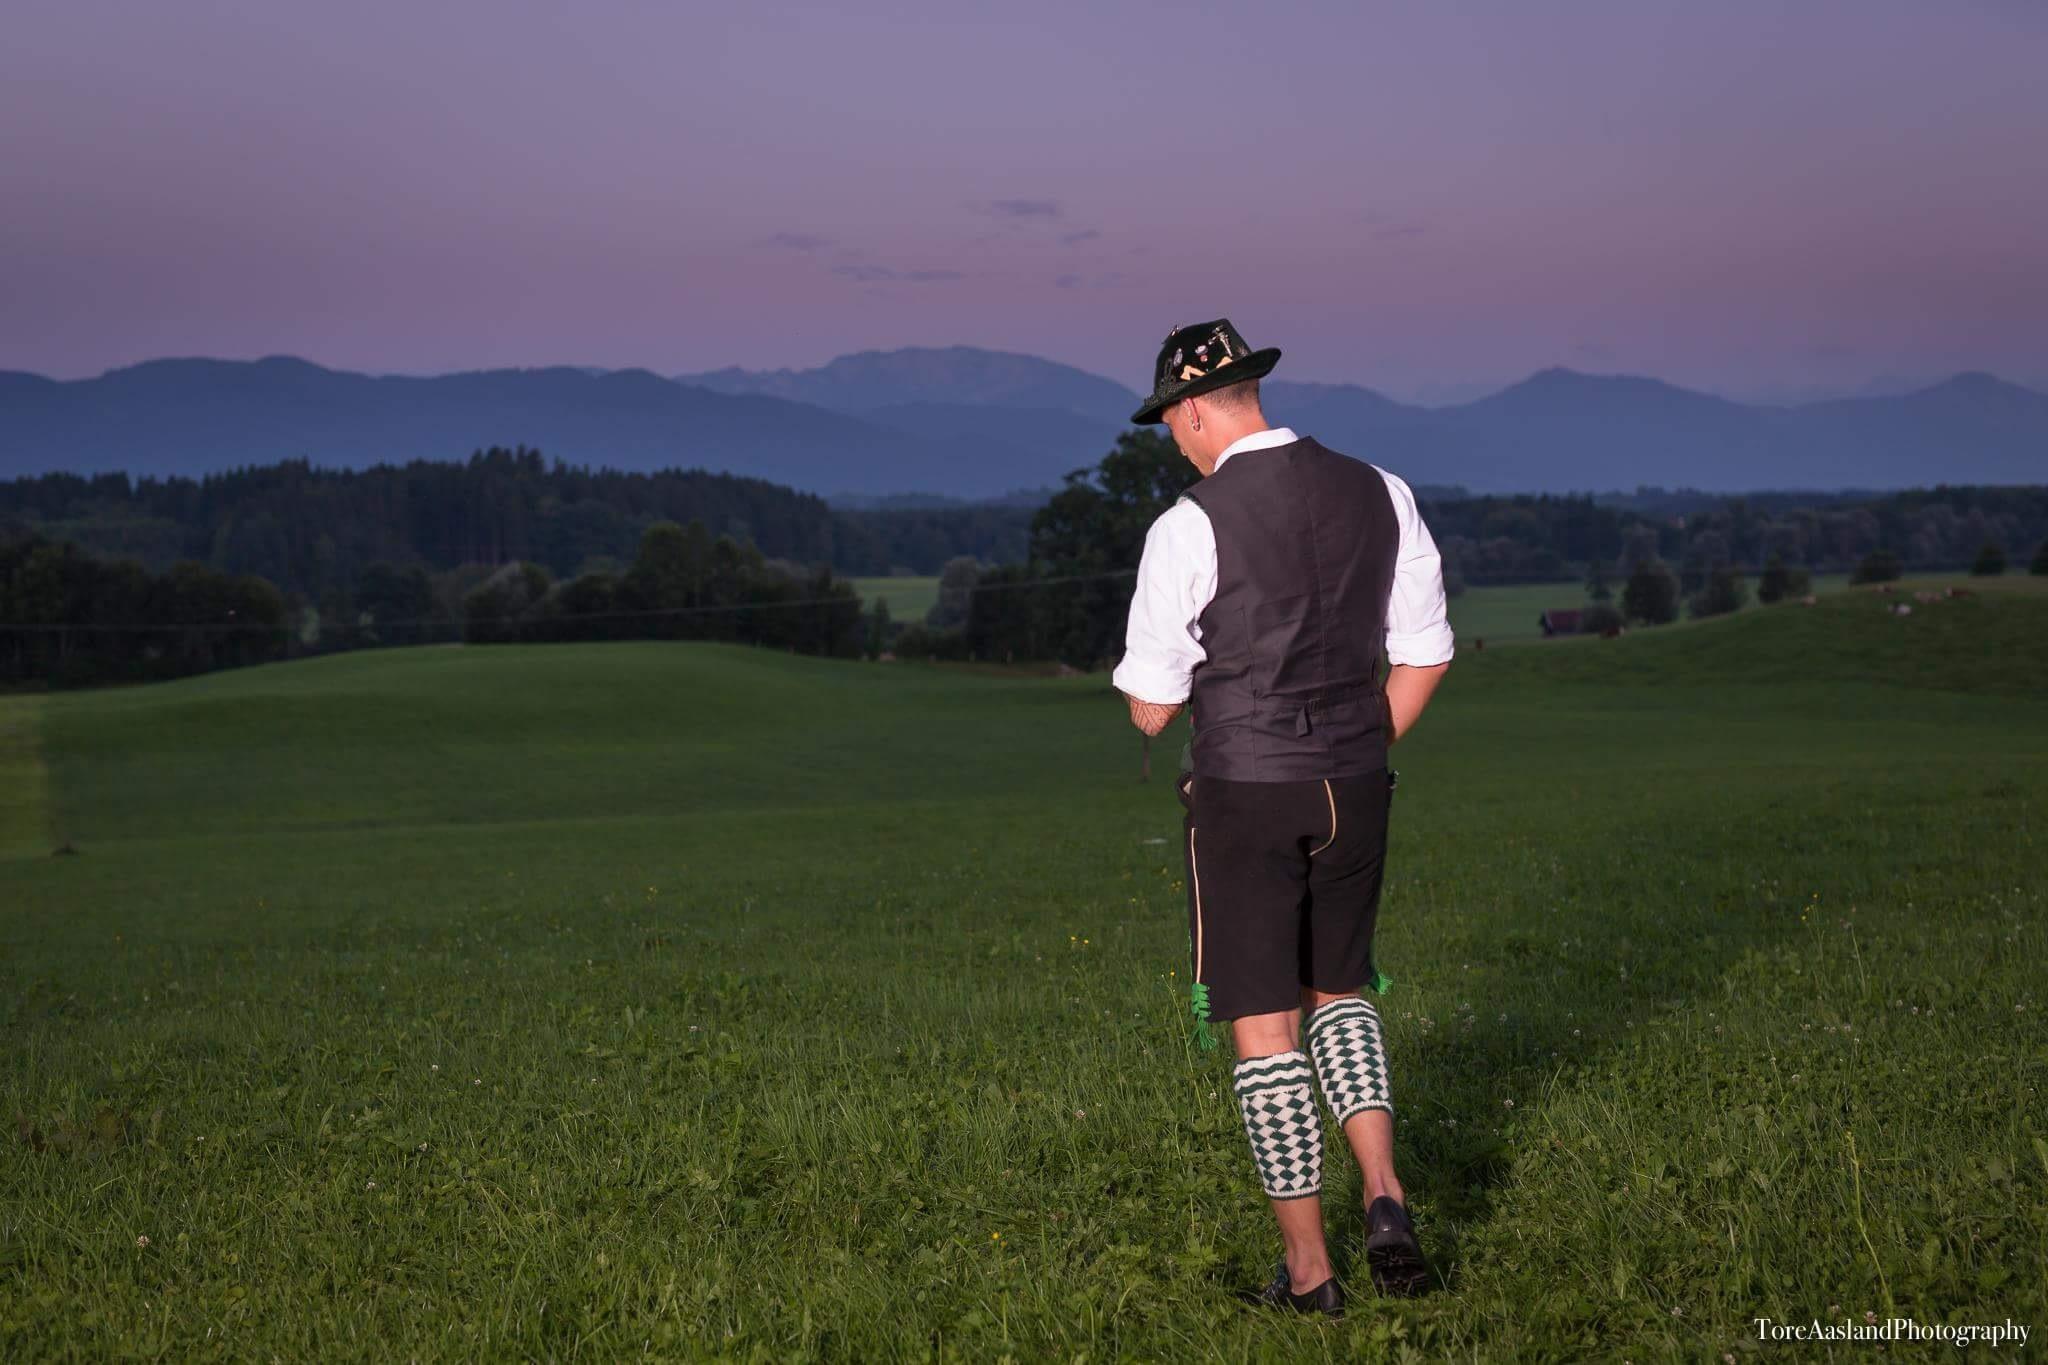 Untitled by BavarianMaleModel